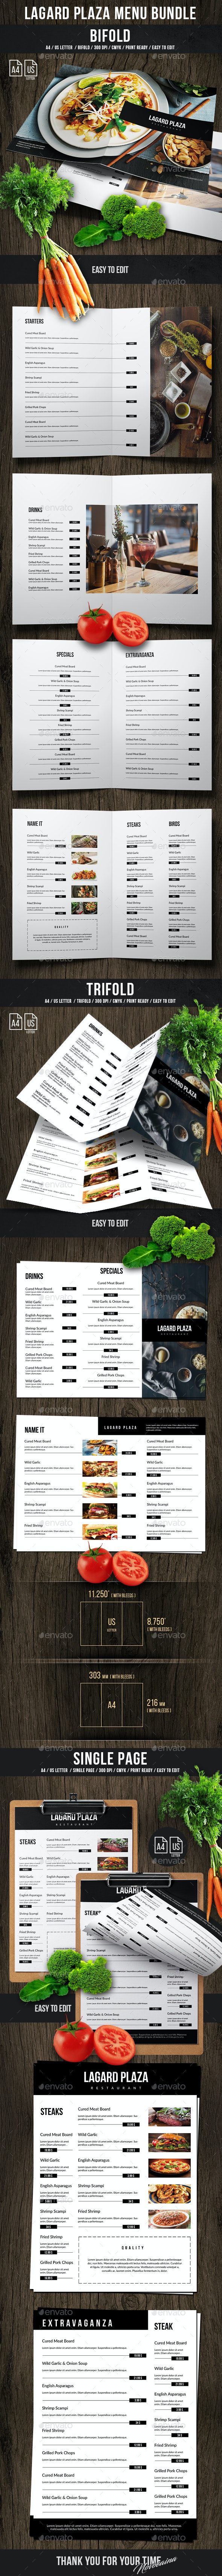 Lagard Plaza Food Menu Bundle - Food Menus Print Templates